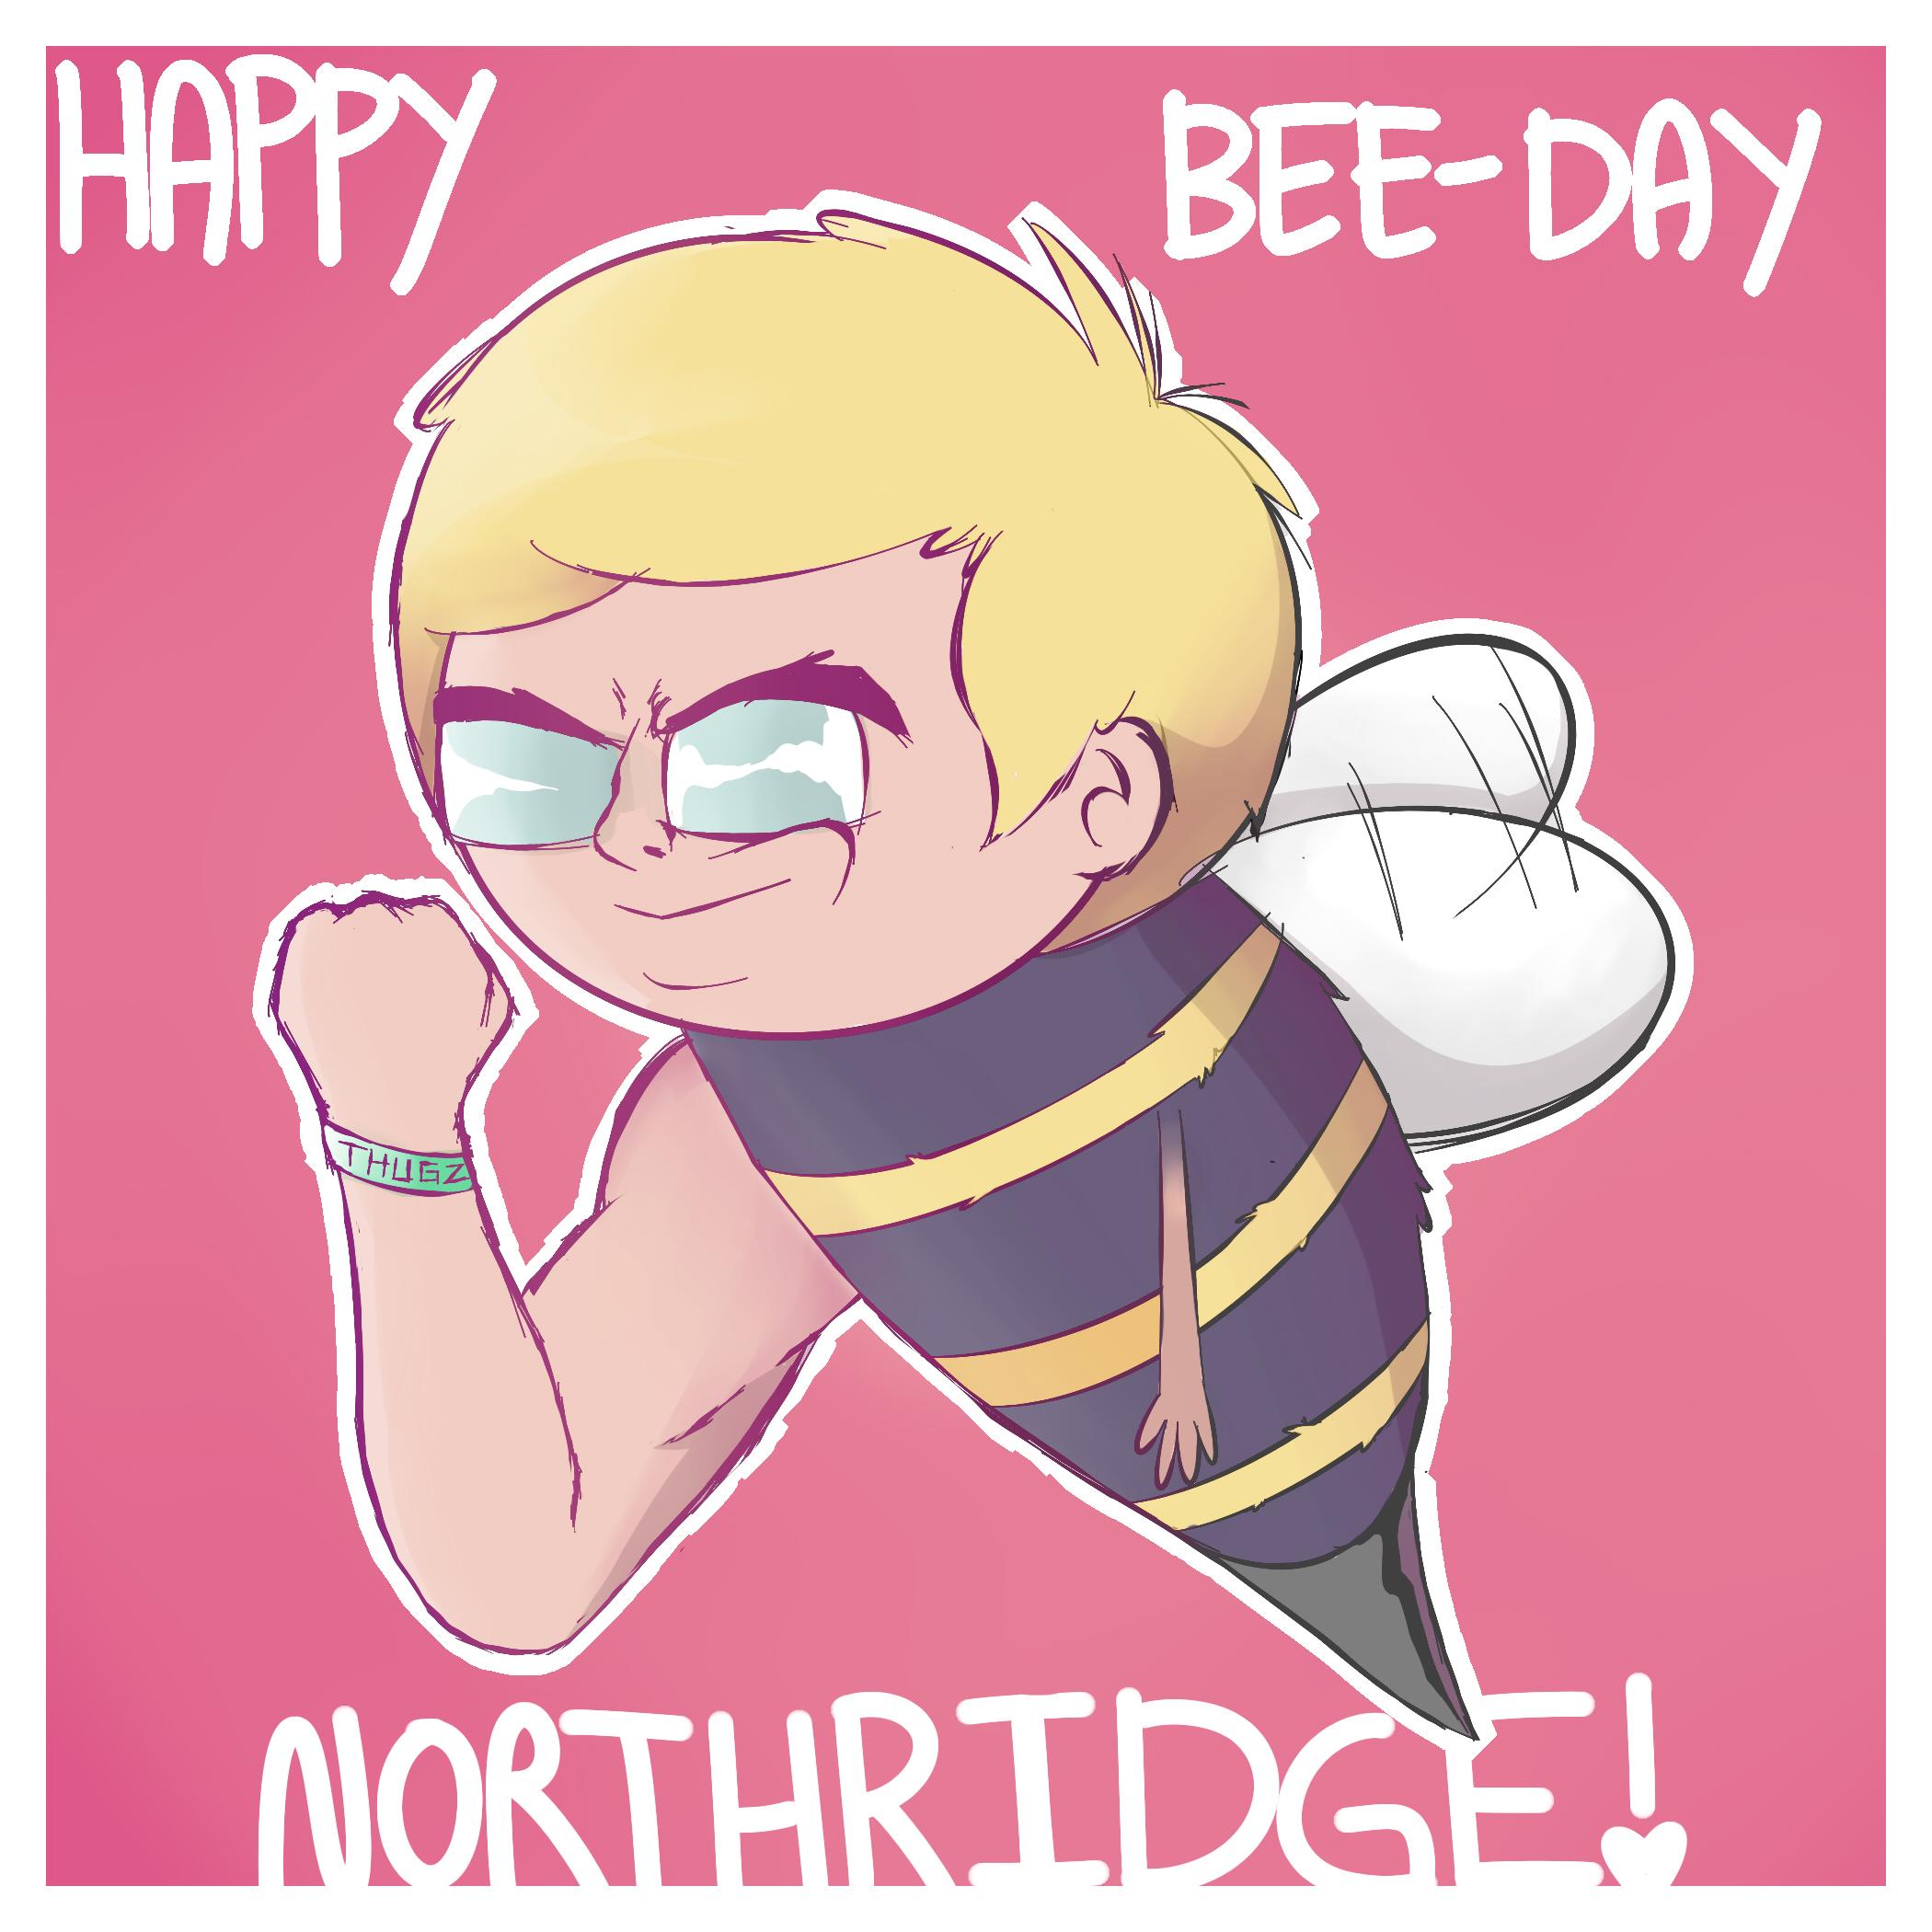 Happy B-day Northridge